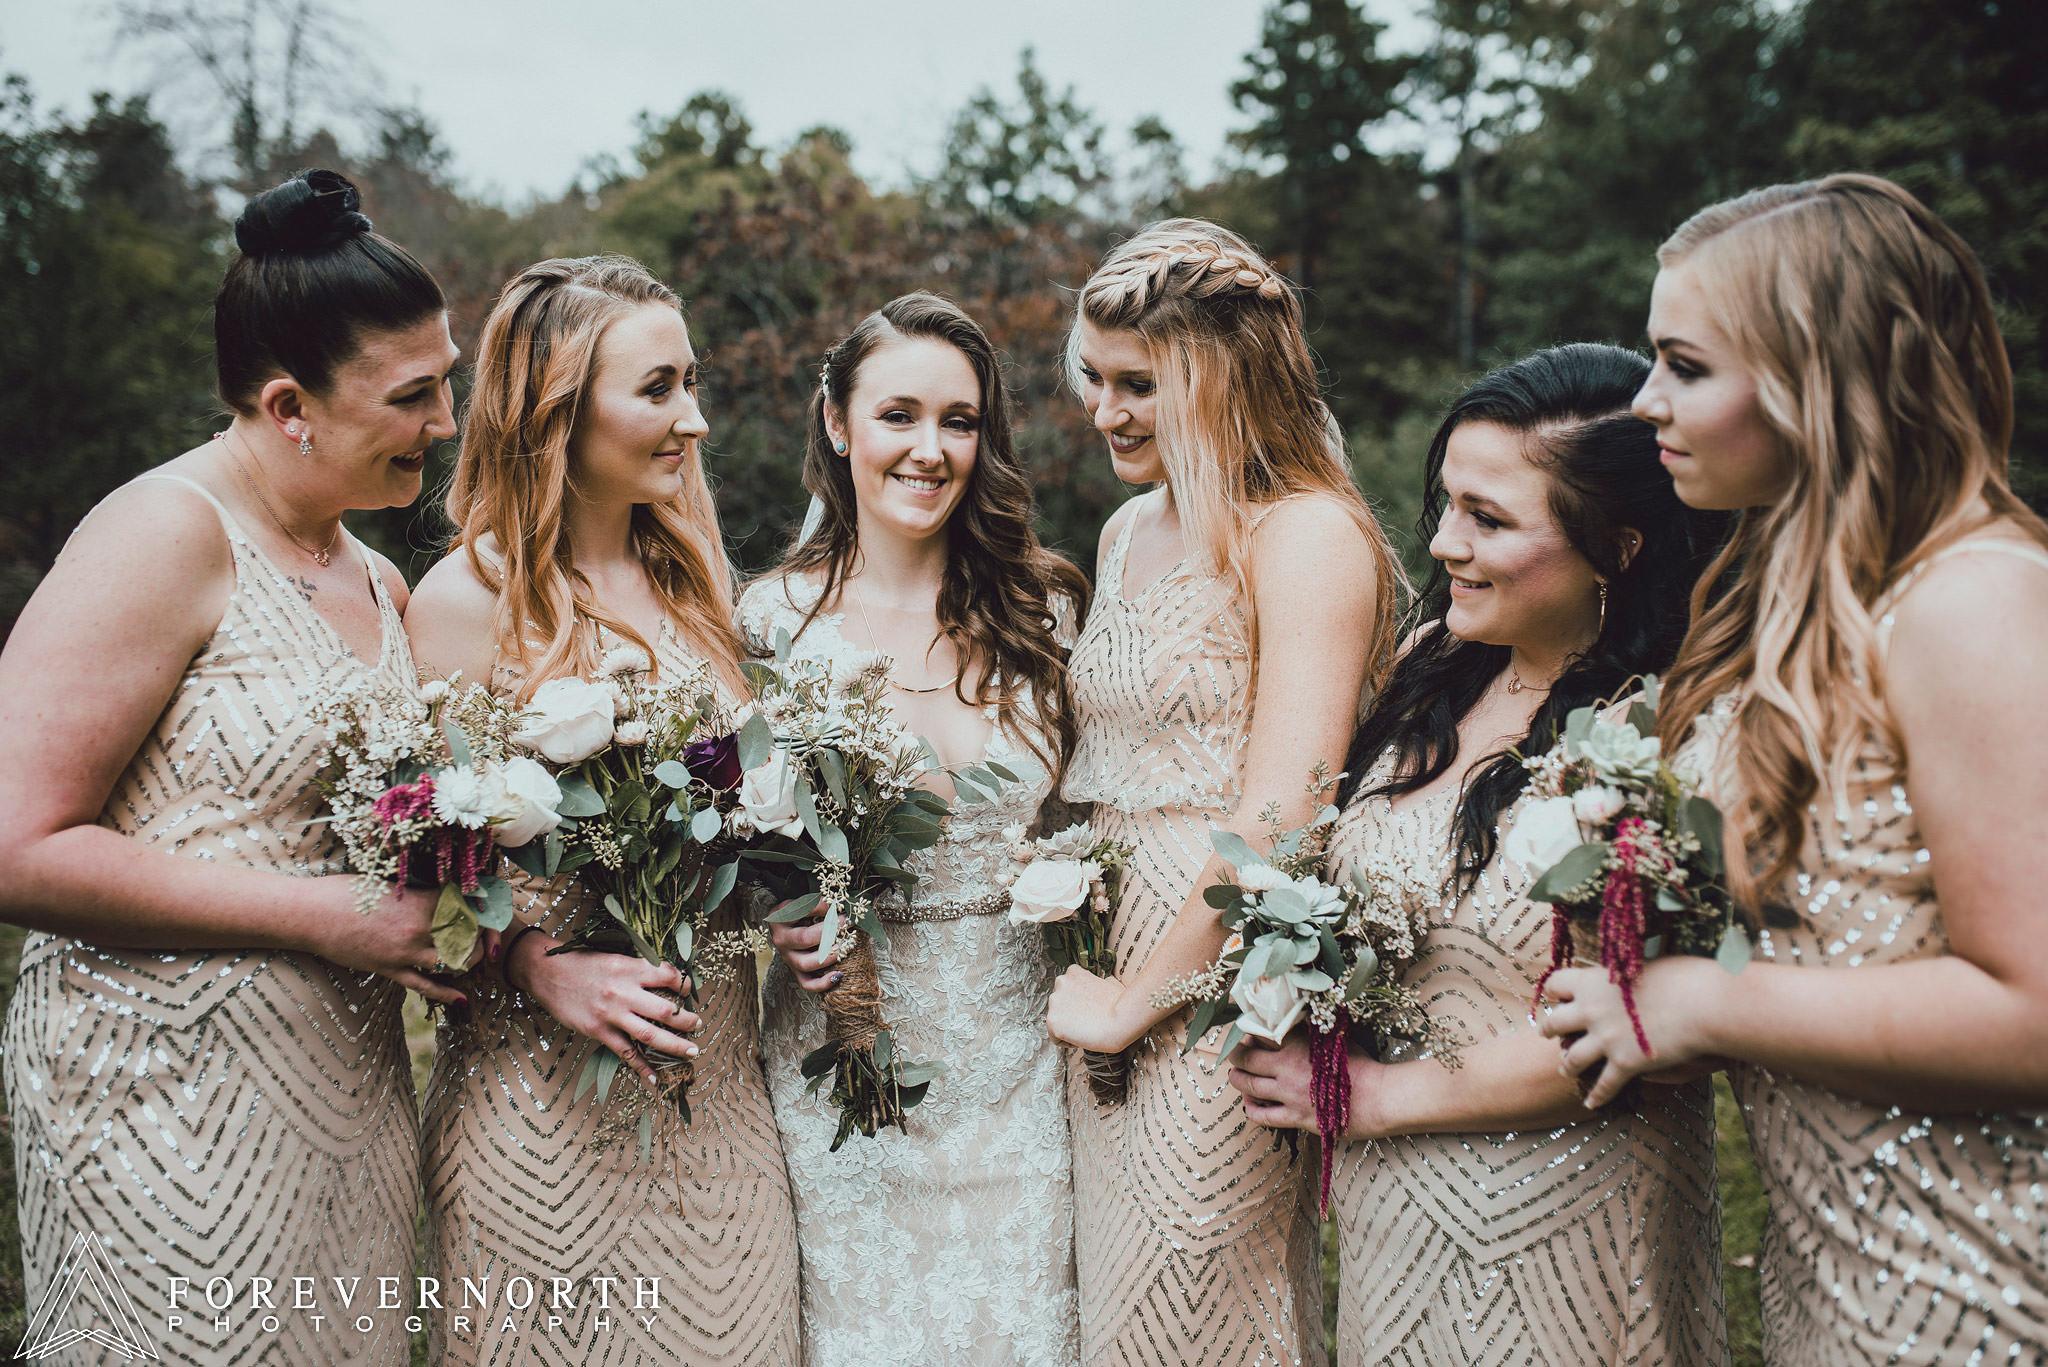 Perkins-Whitesbog-Village-Wedding-Photographer-22.JPG